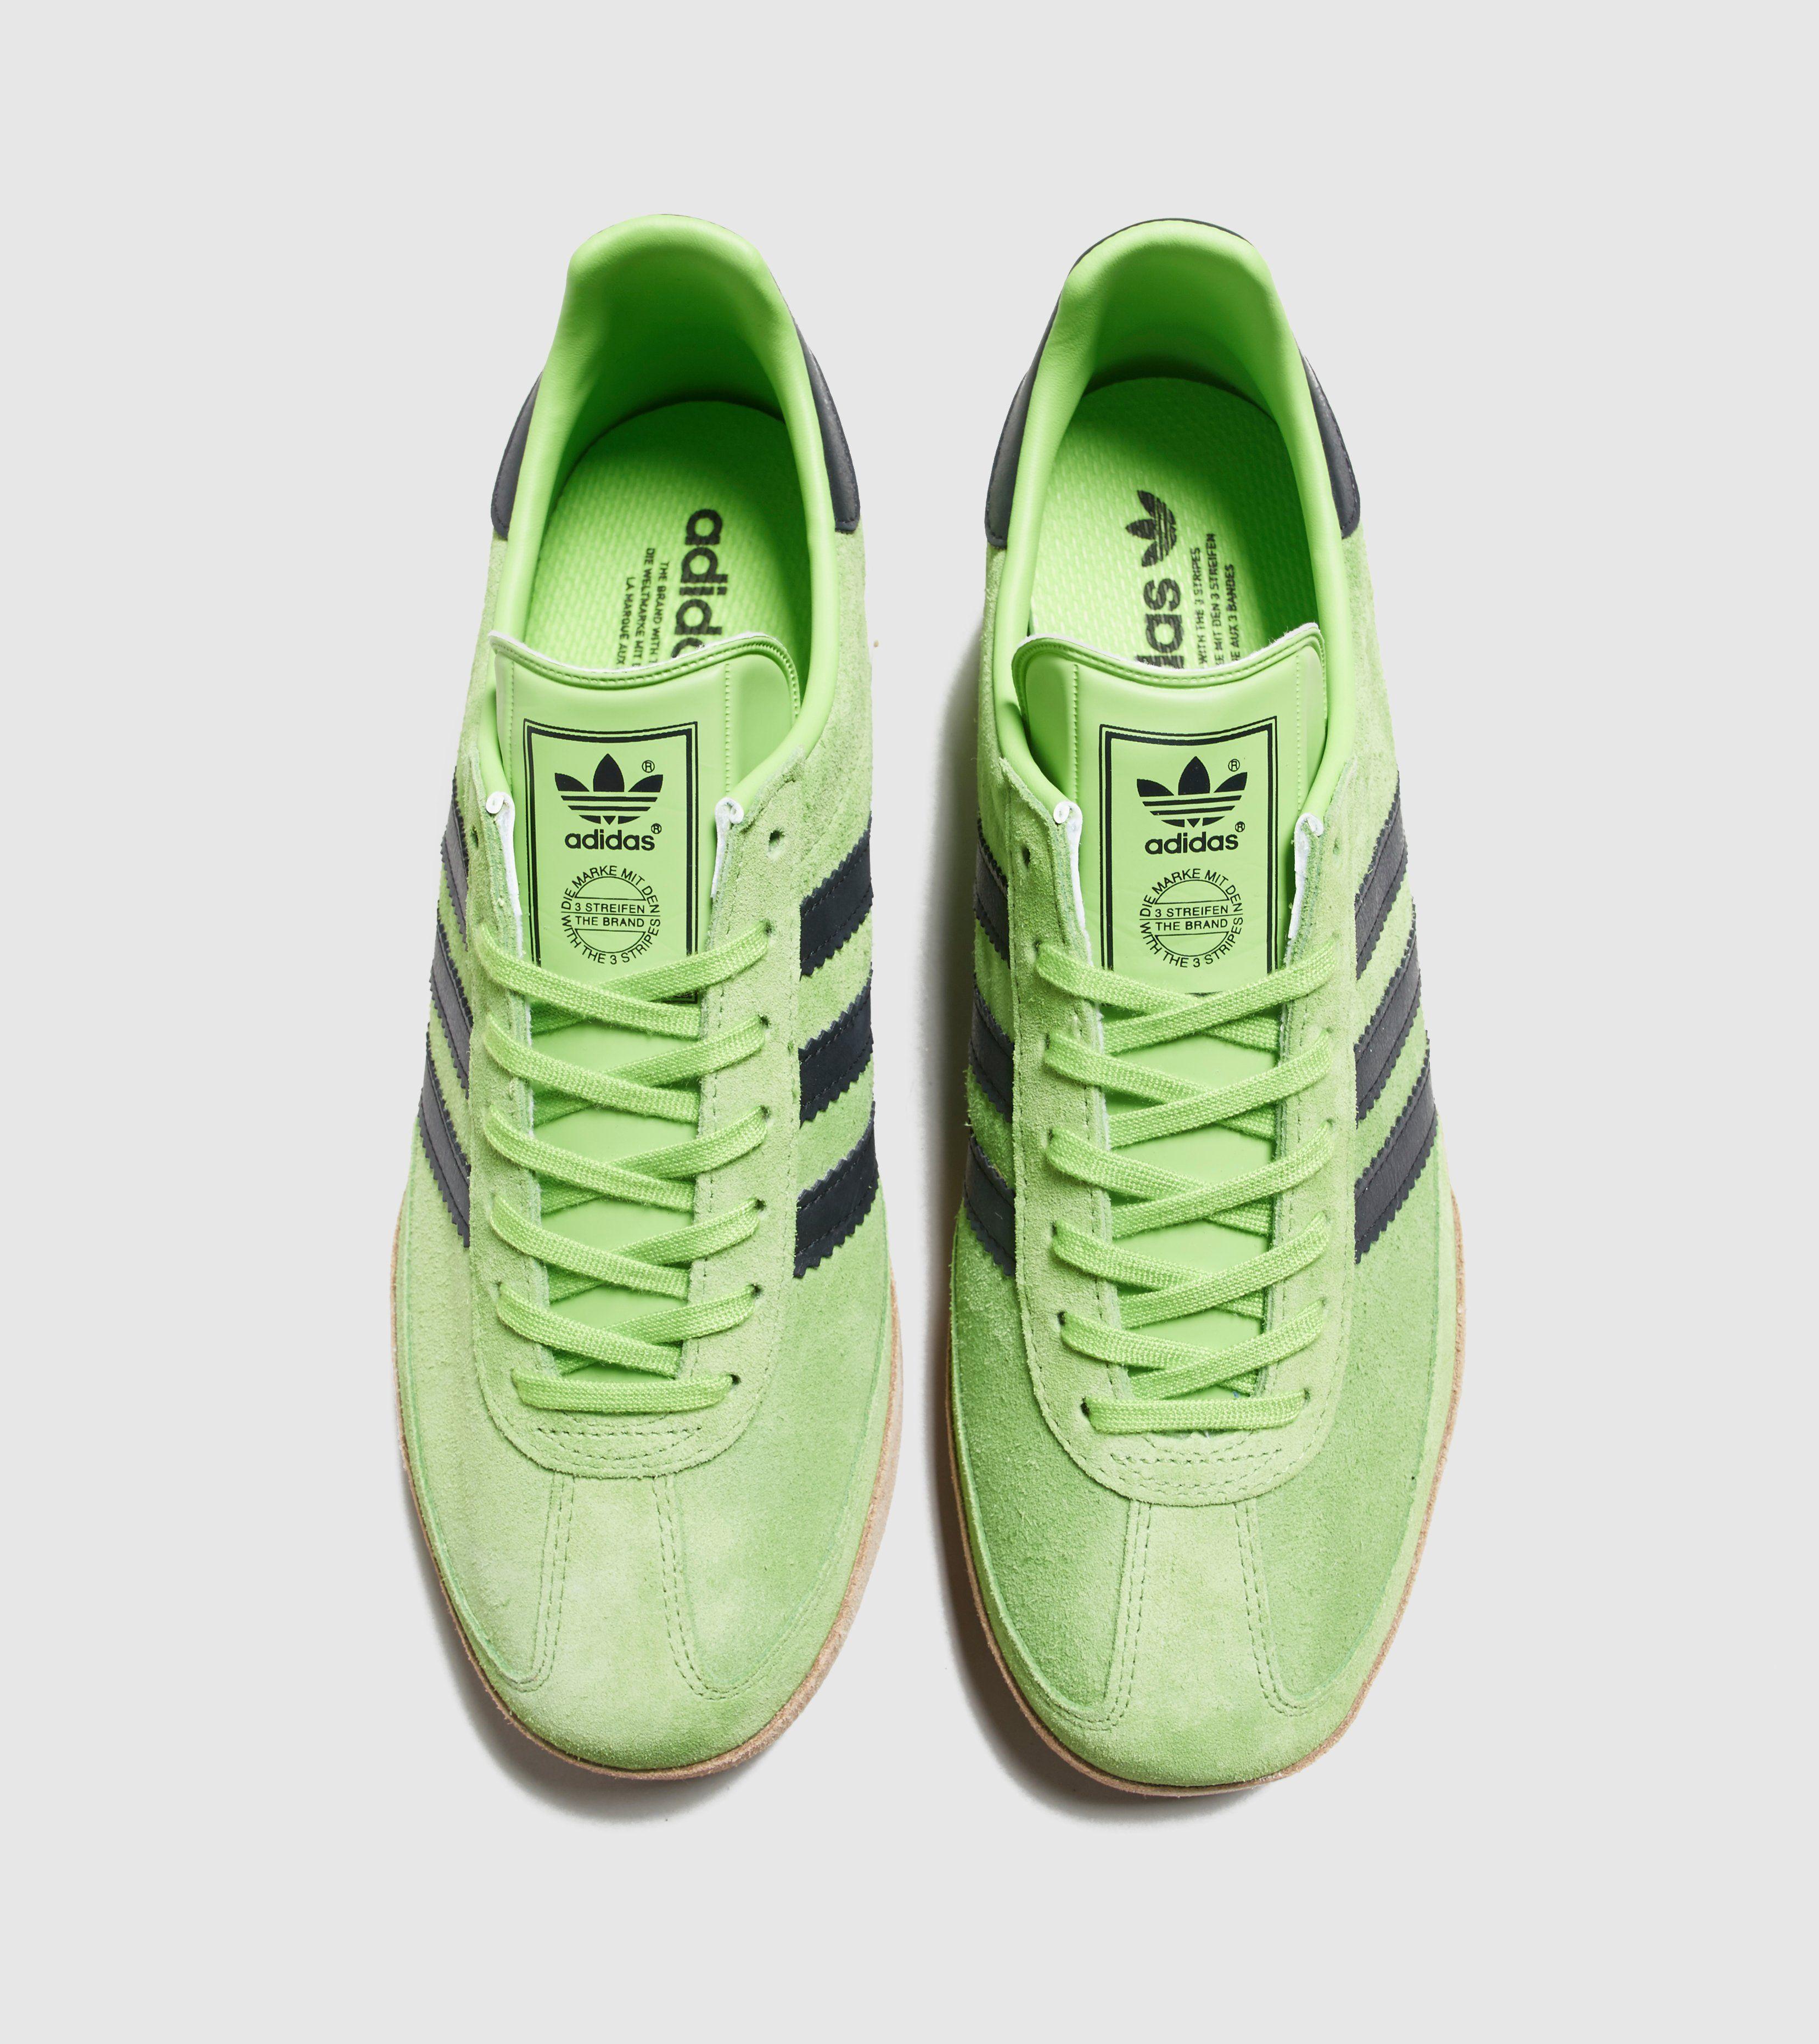 adidas Originals Kegler Super - size? Exclusive